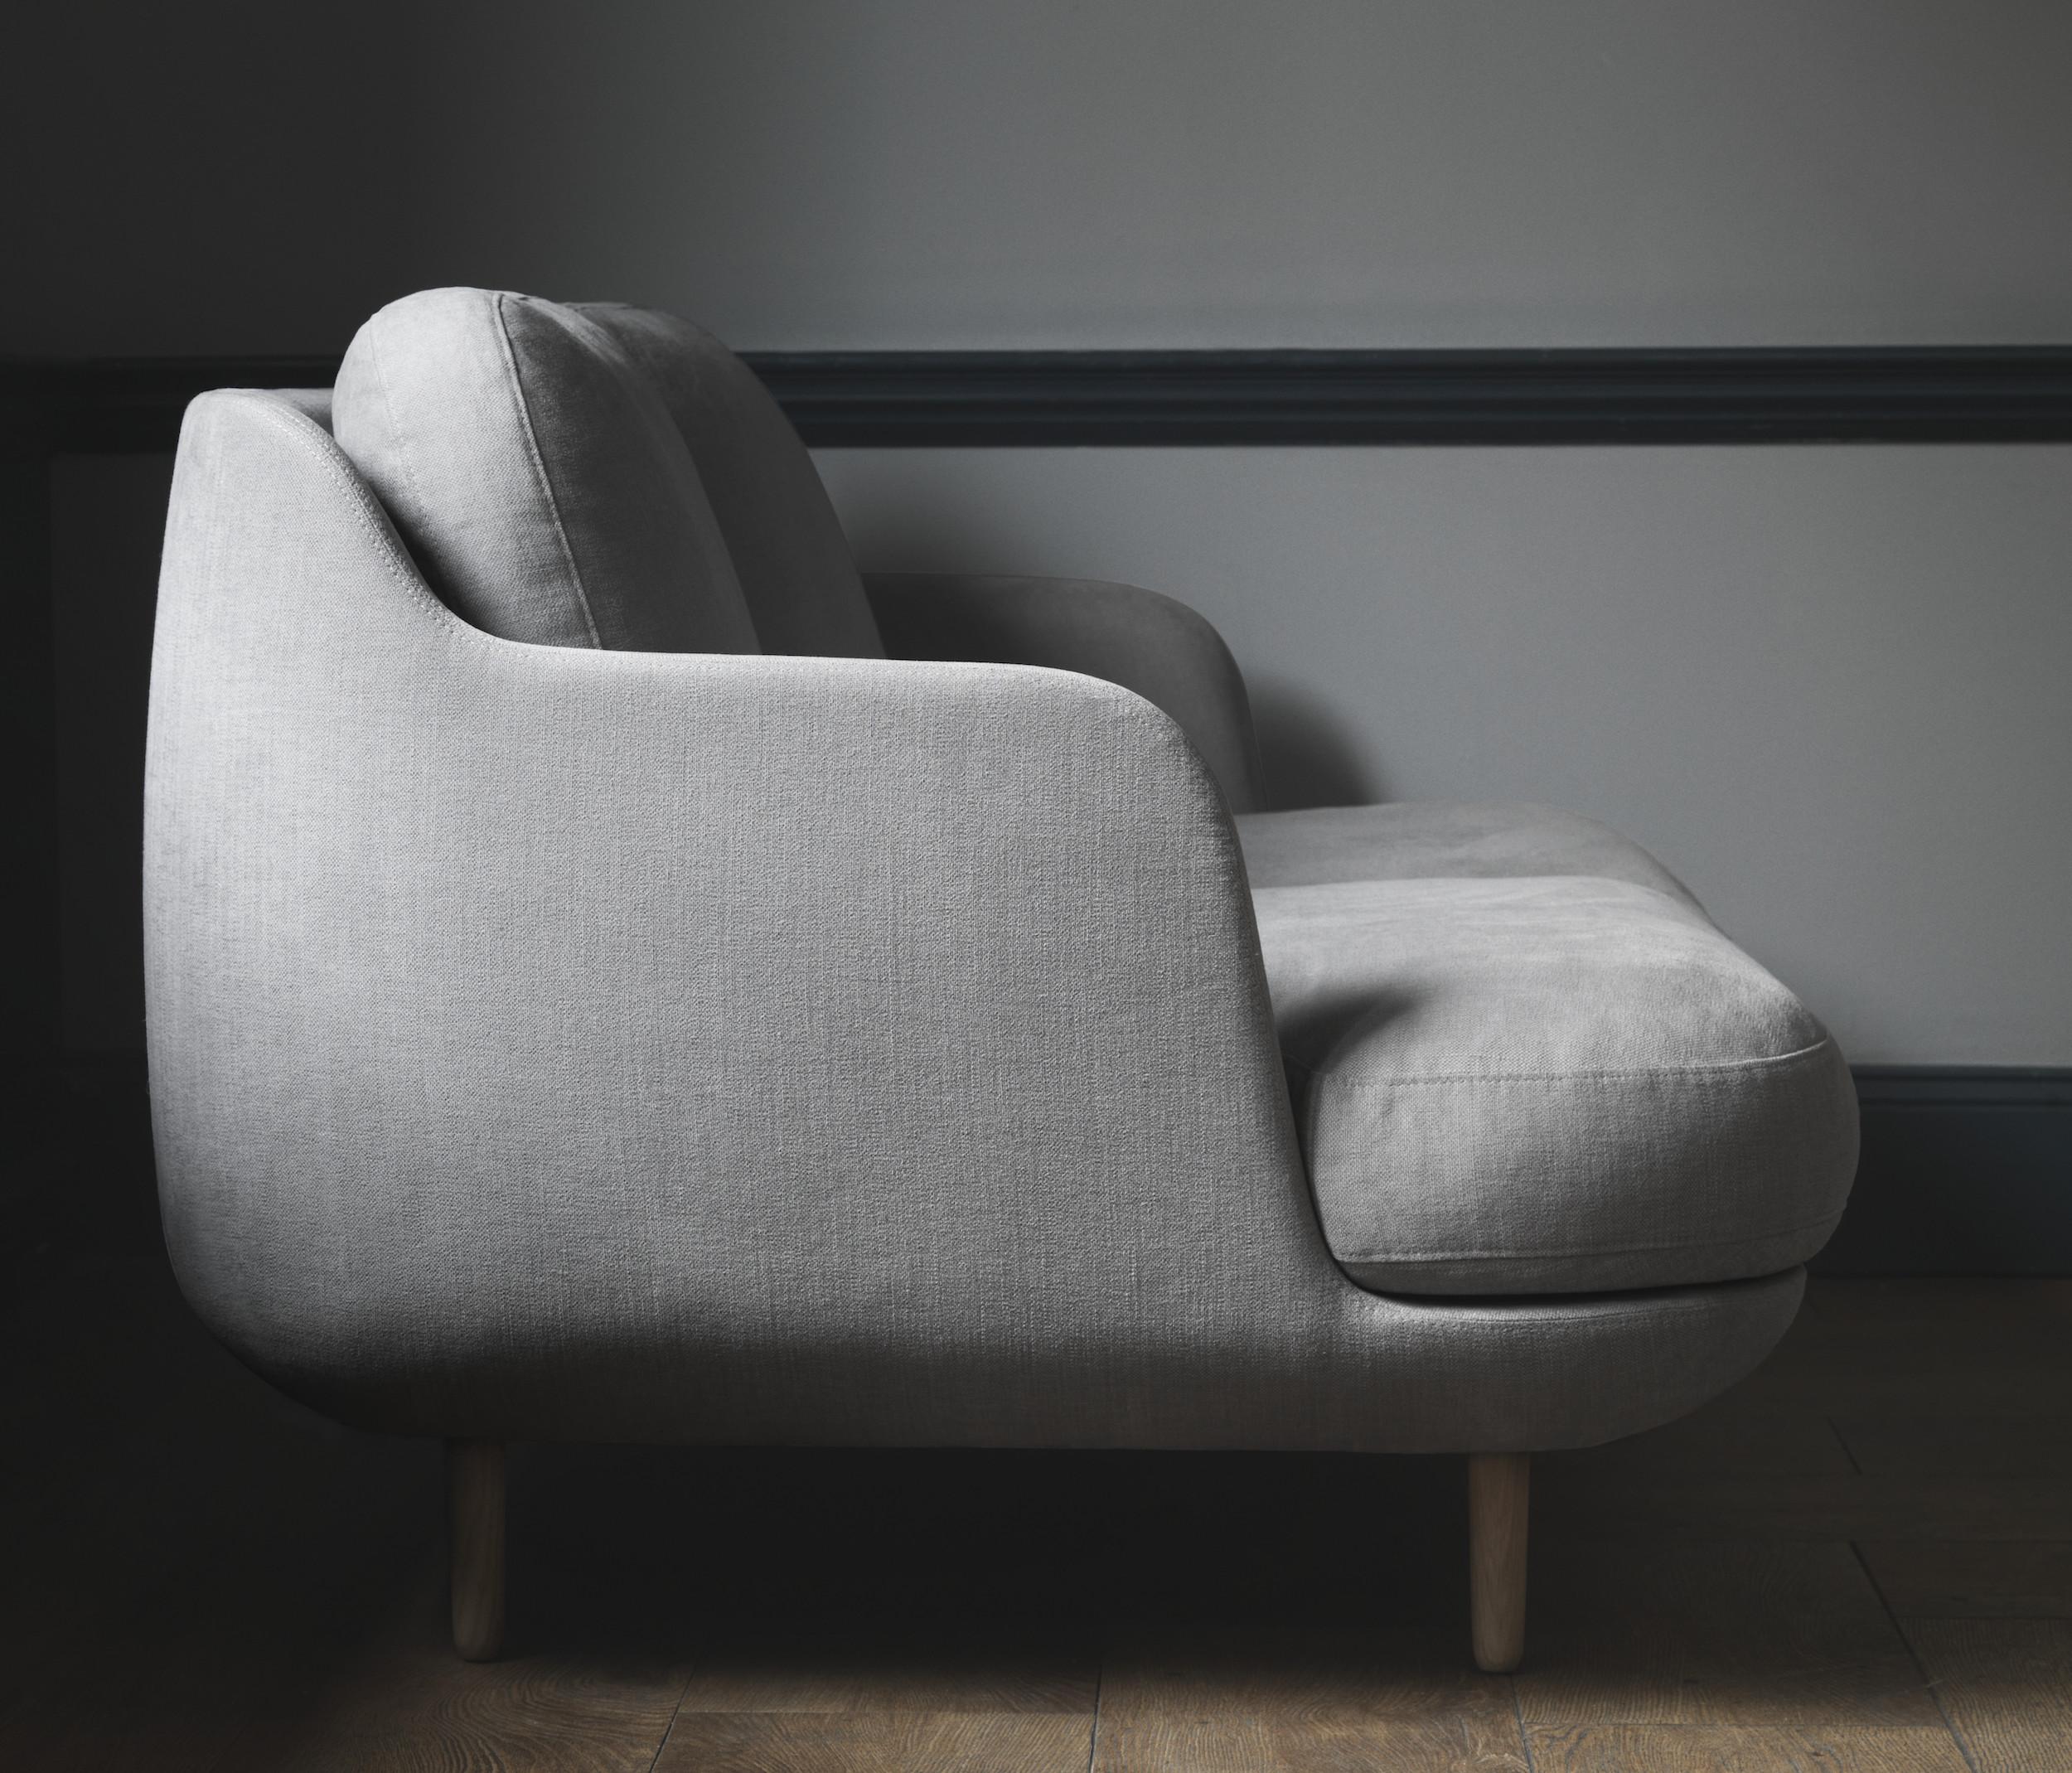 Fritz hansen lune modular sofa design jaime hay n for Idee de decoration interieur